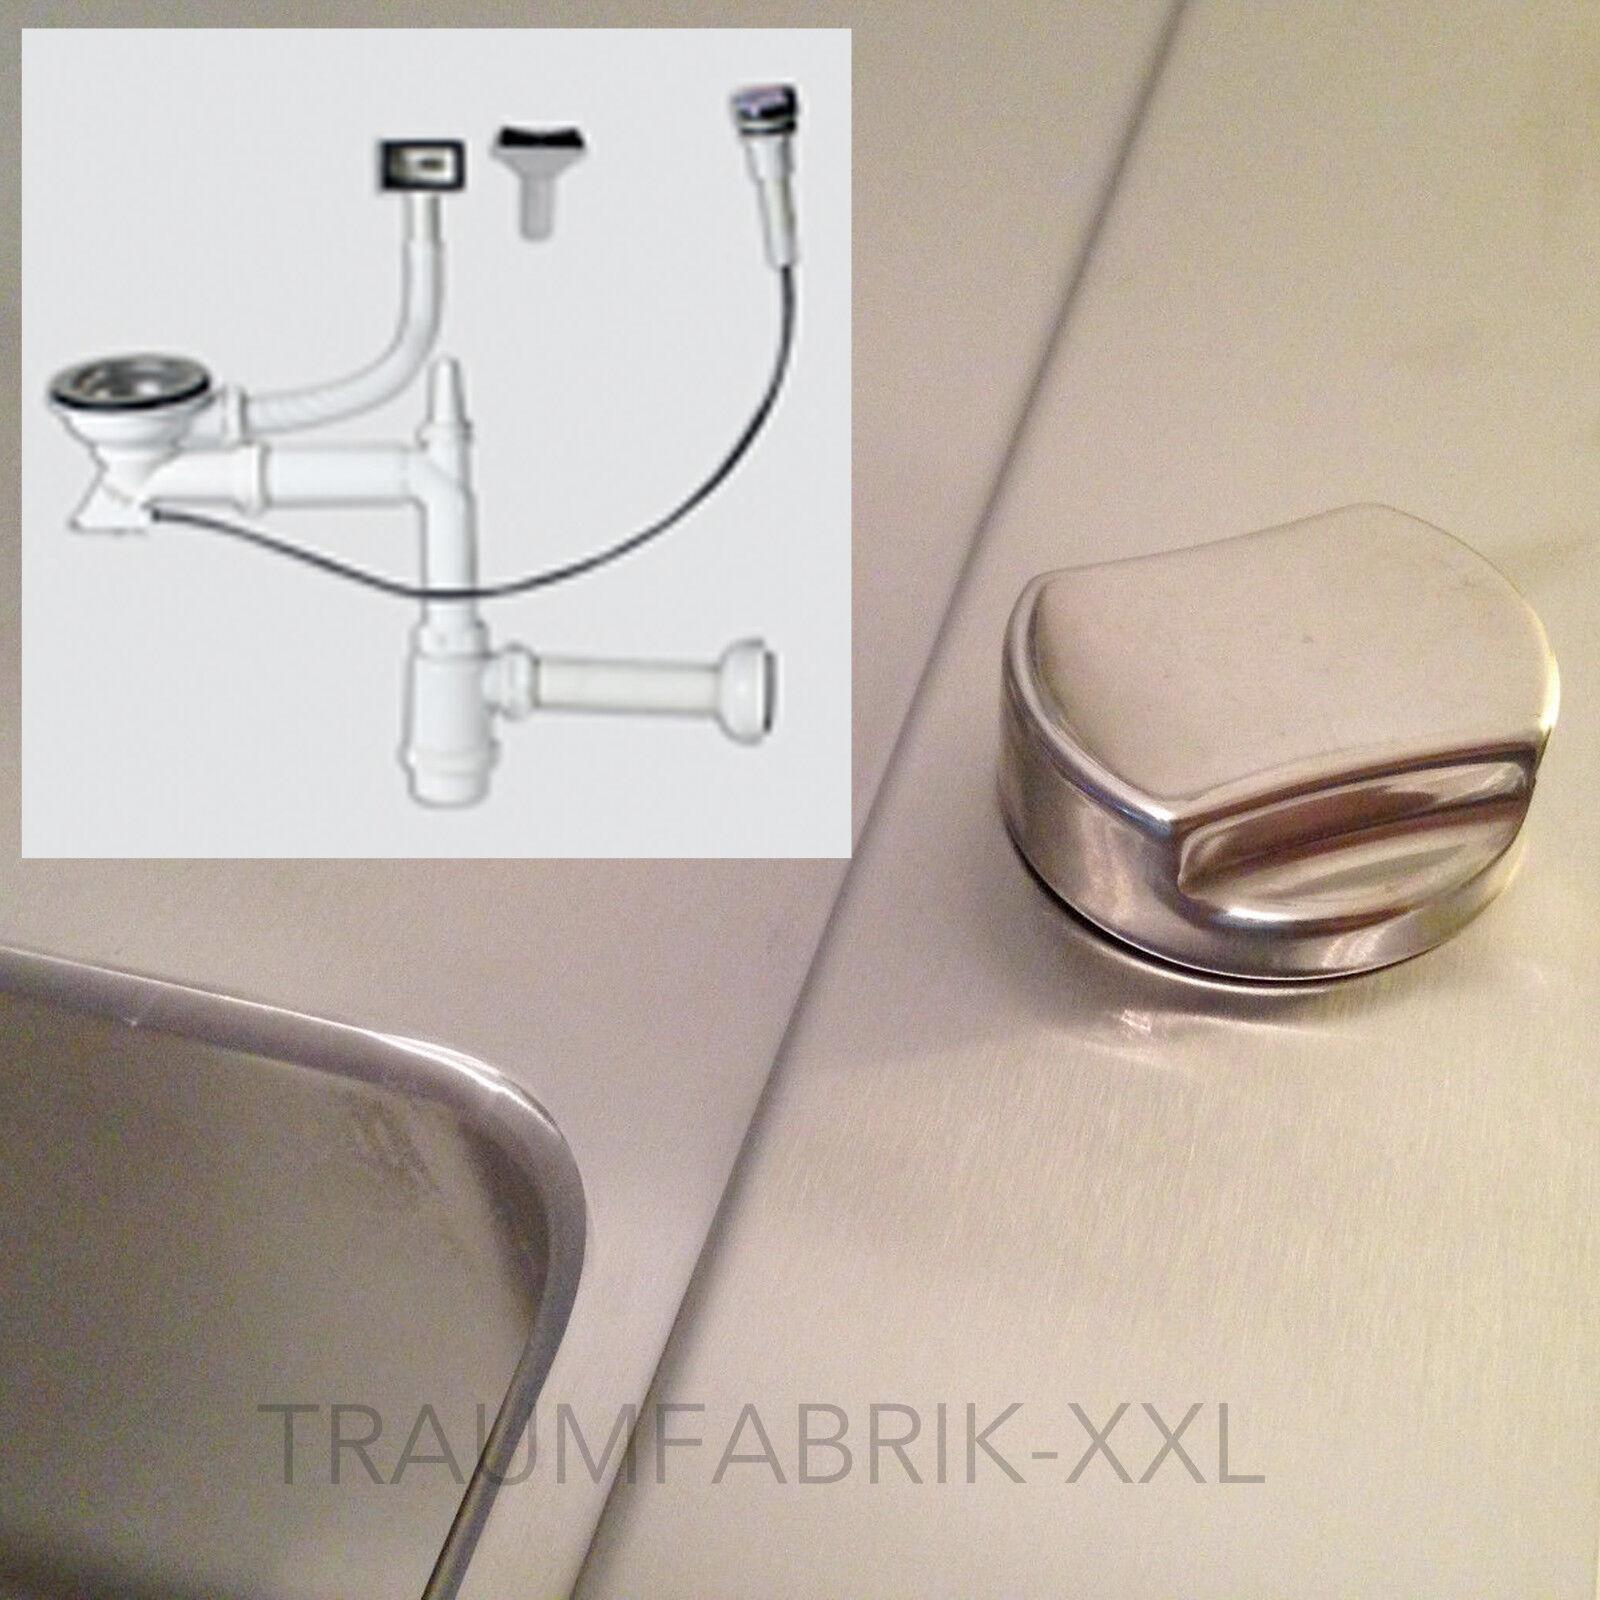 Ikea Küchenspüle Abfluss